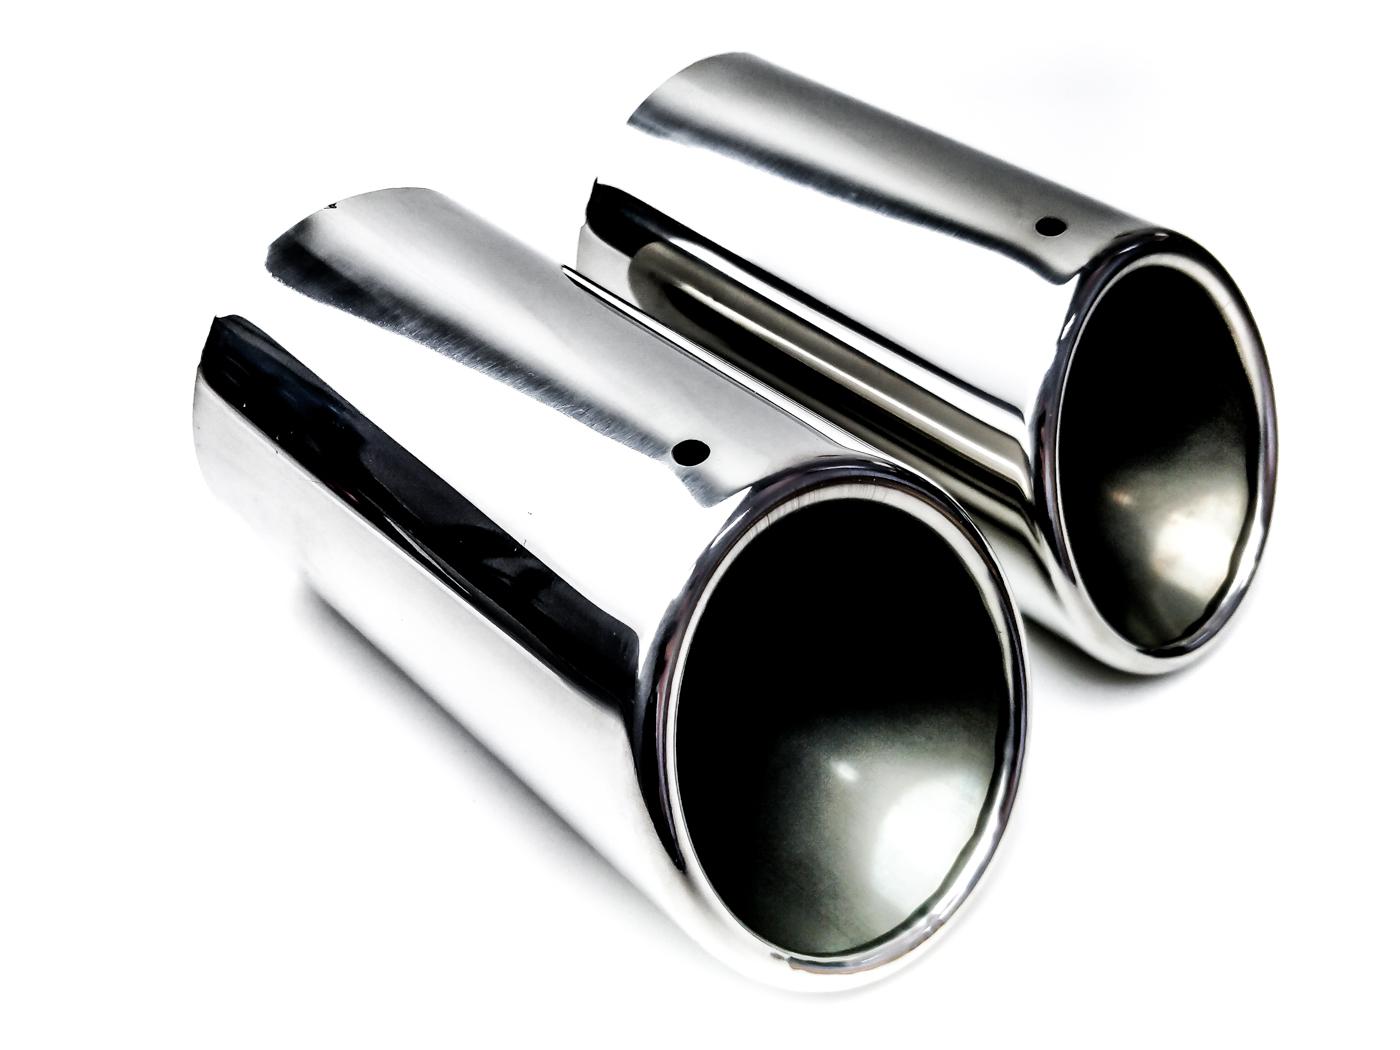 2x наконечники выдохе накладки диаметр 68 69 70mm